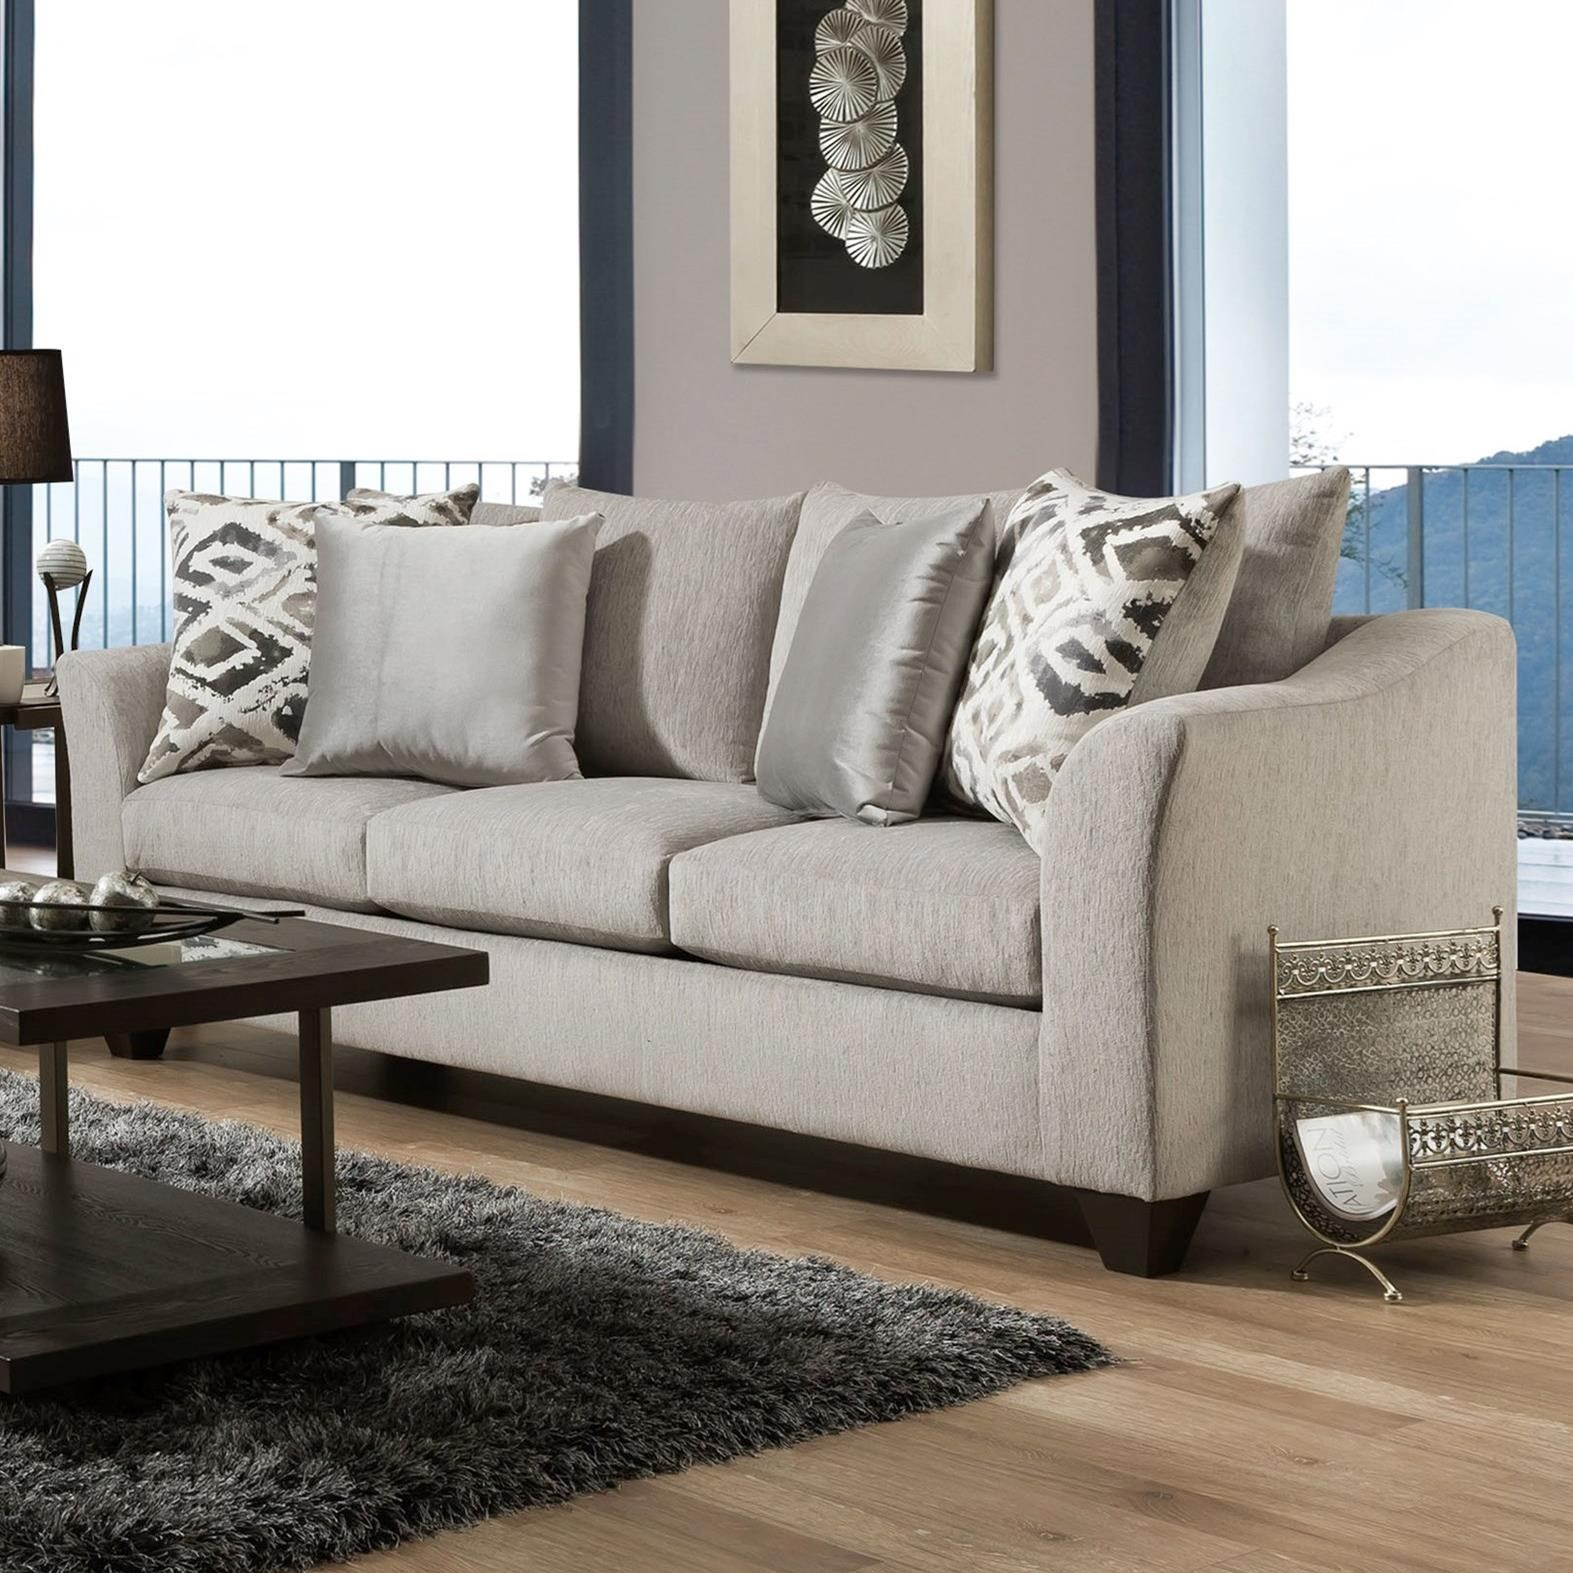 1380 Sofa by Peak Living at Prime Brothers Furniture